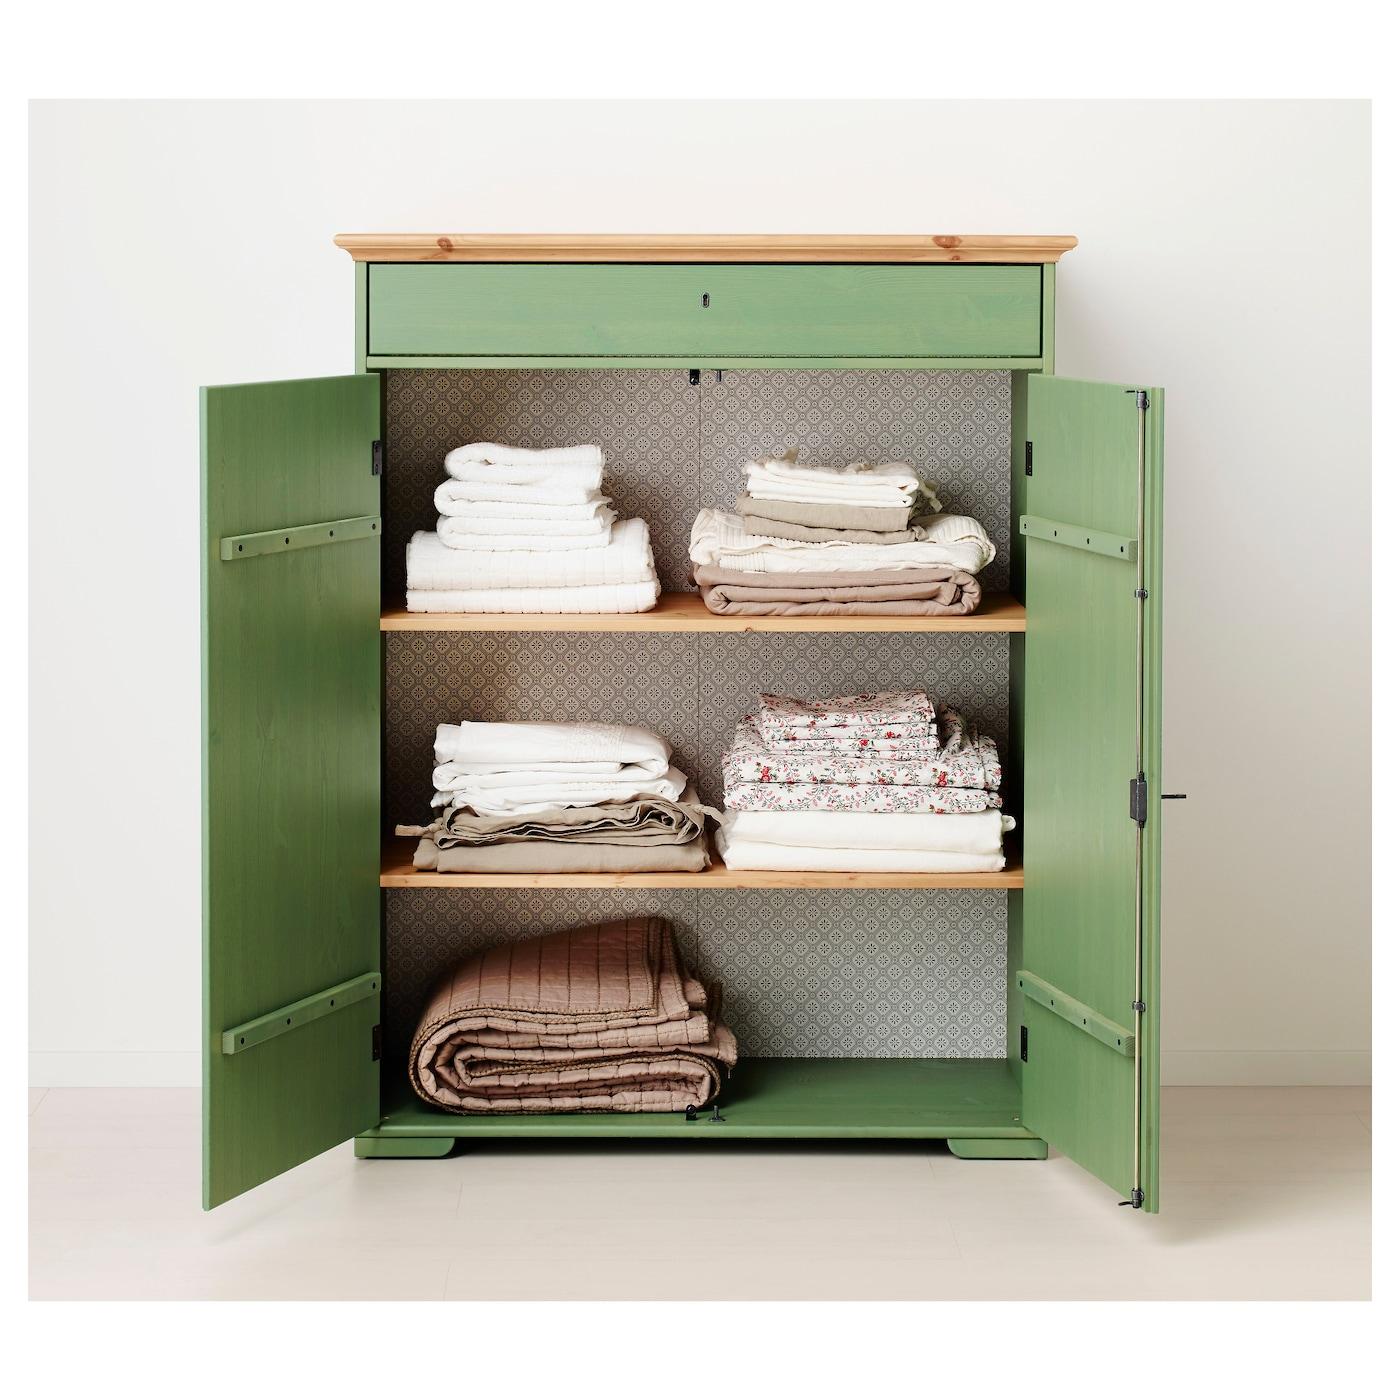 Hurdal linen cabinet green 109x50x137 cm ikea - Ikea cucine free standing ...